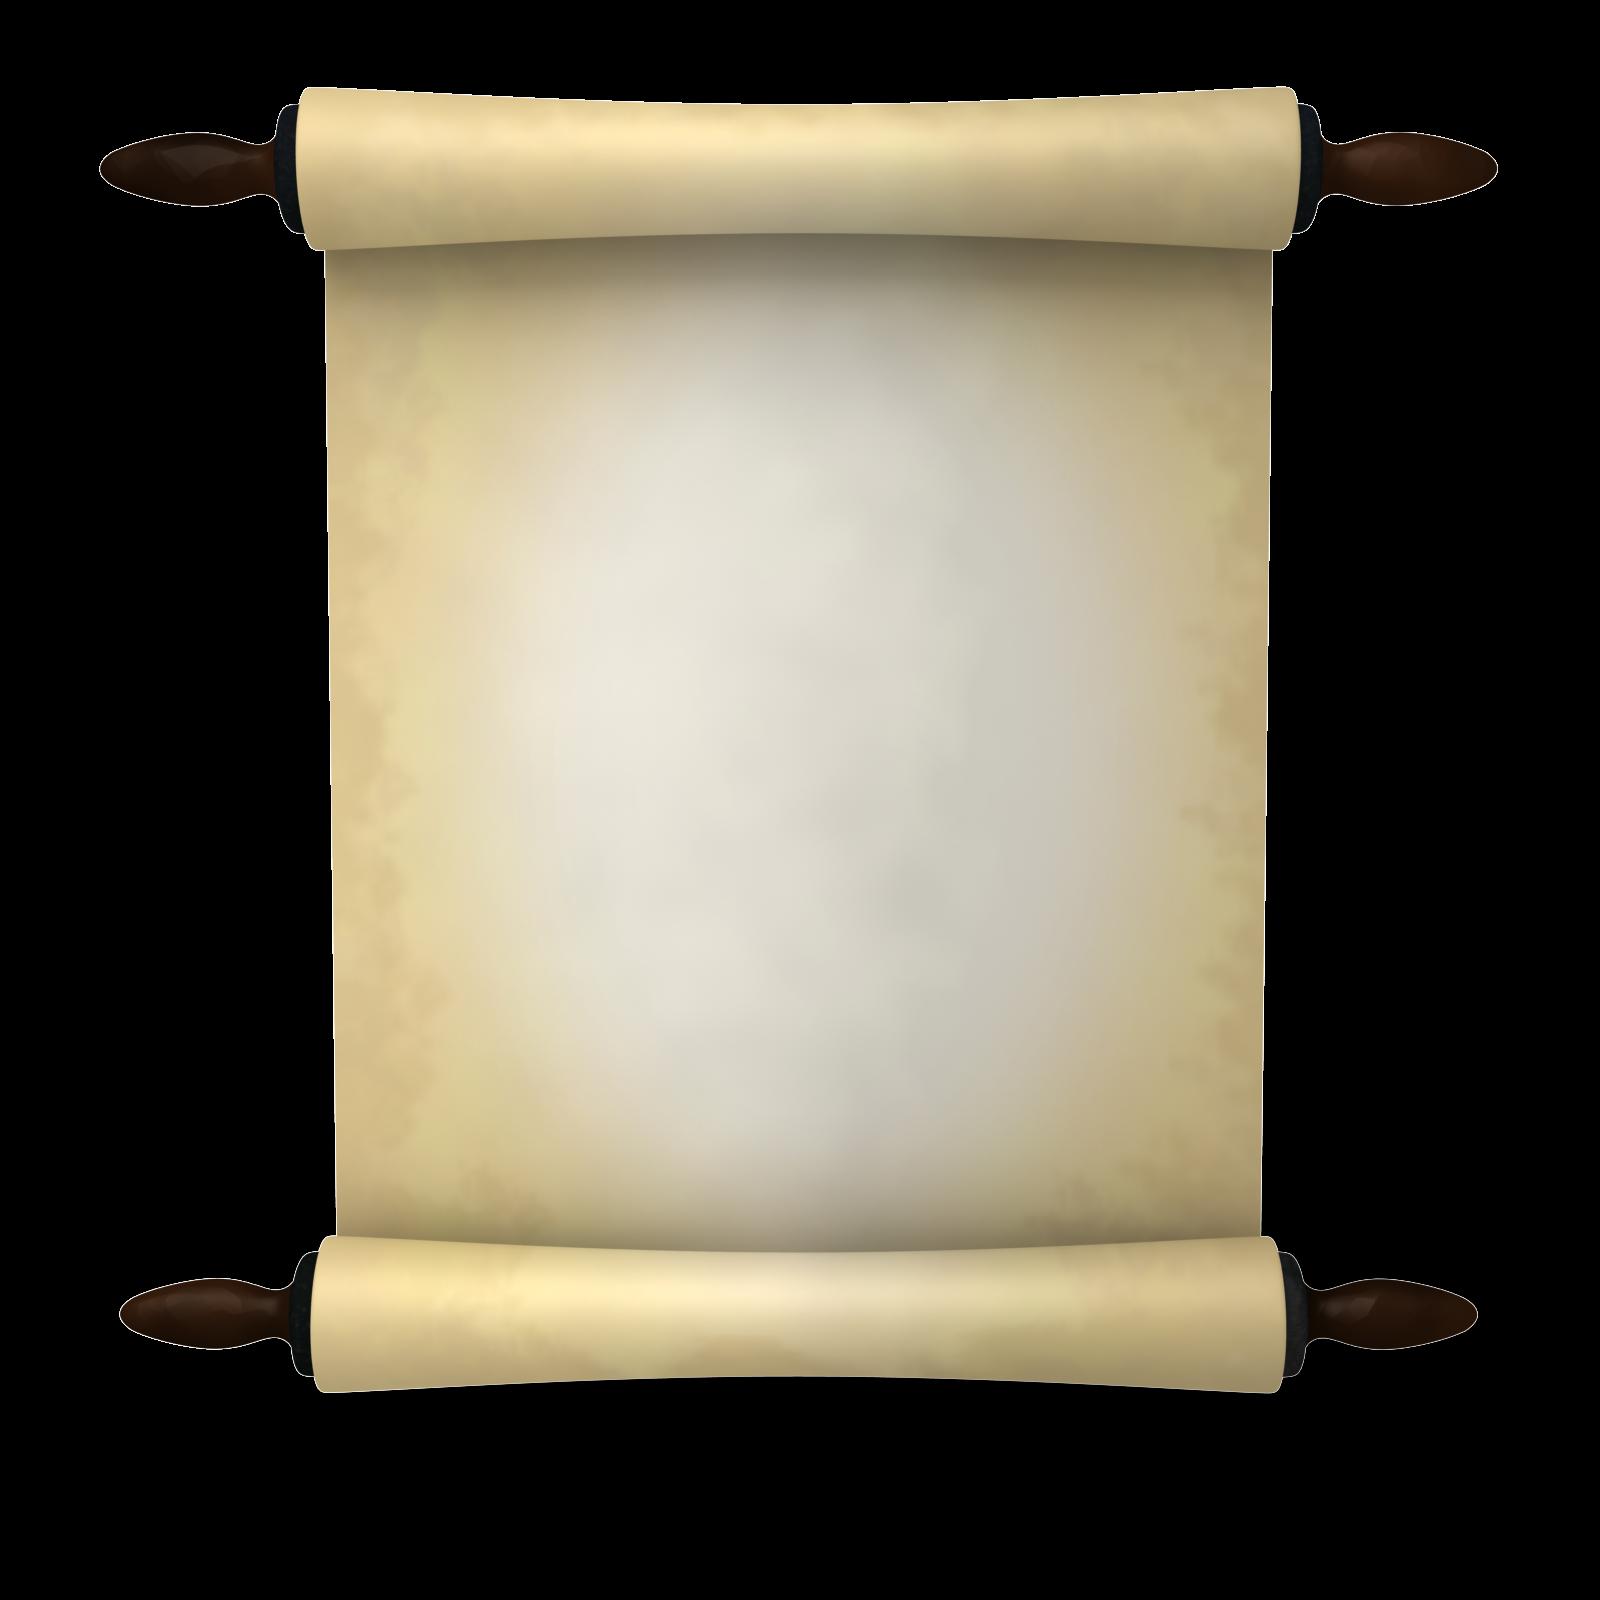 Ancient Scroll Paper Ancient Scroll Paper Ancient